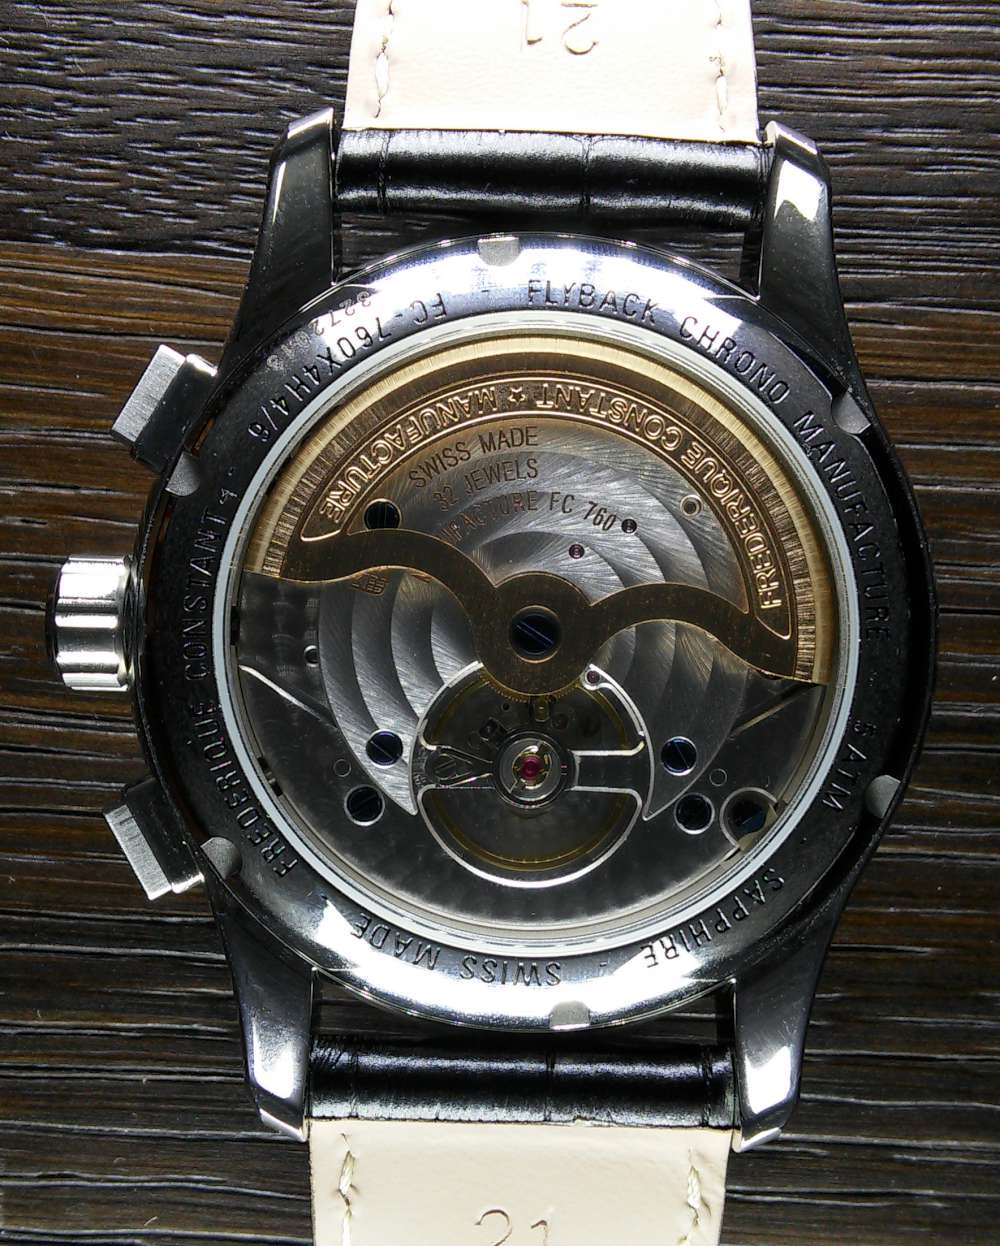 Frederique Constant Flyback Chronograph Manufacture, caseback